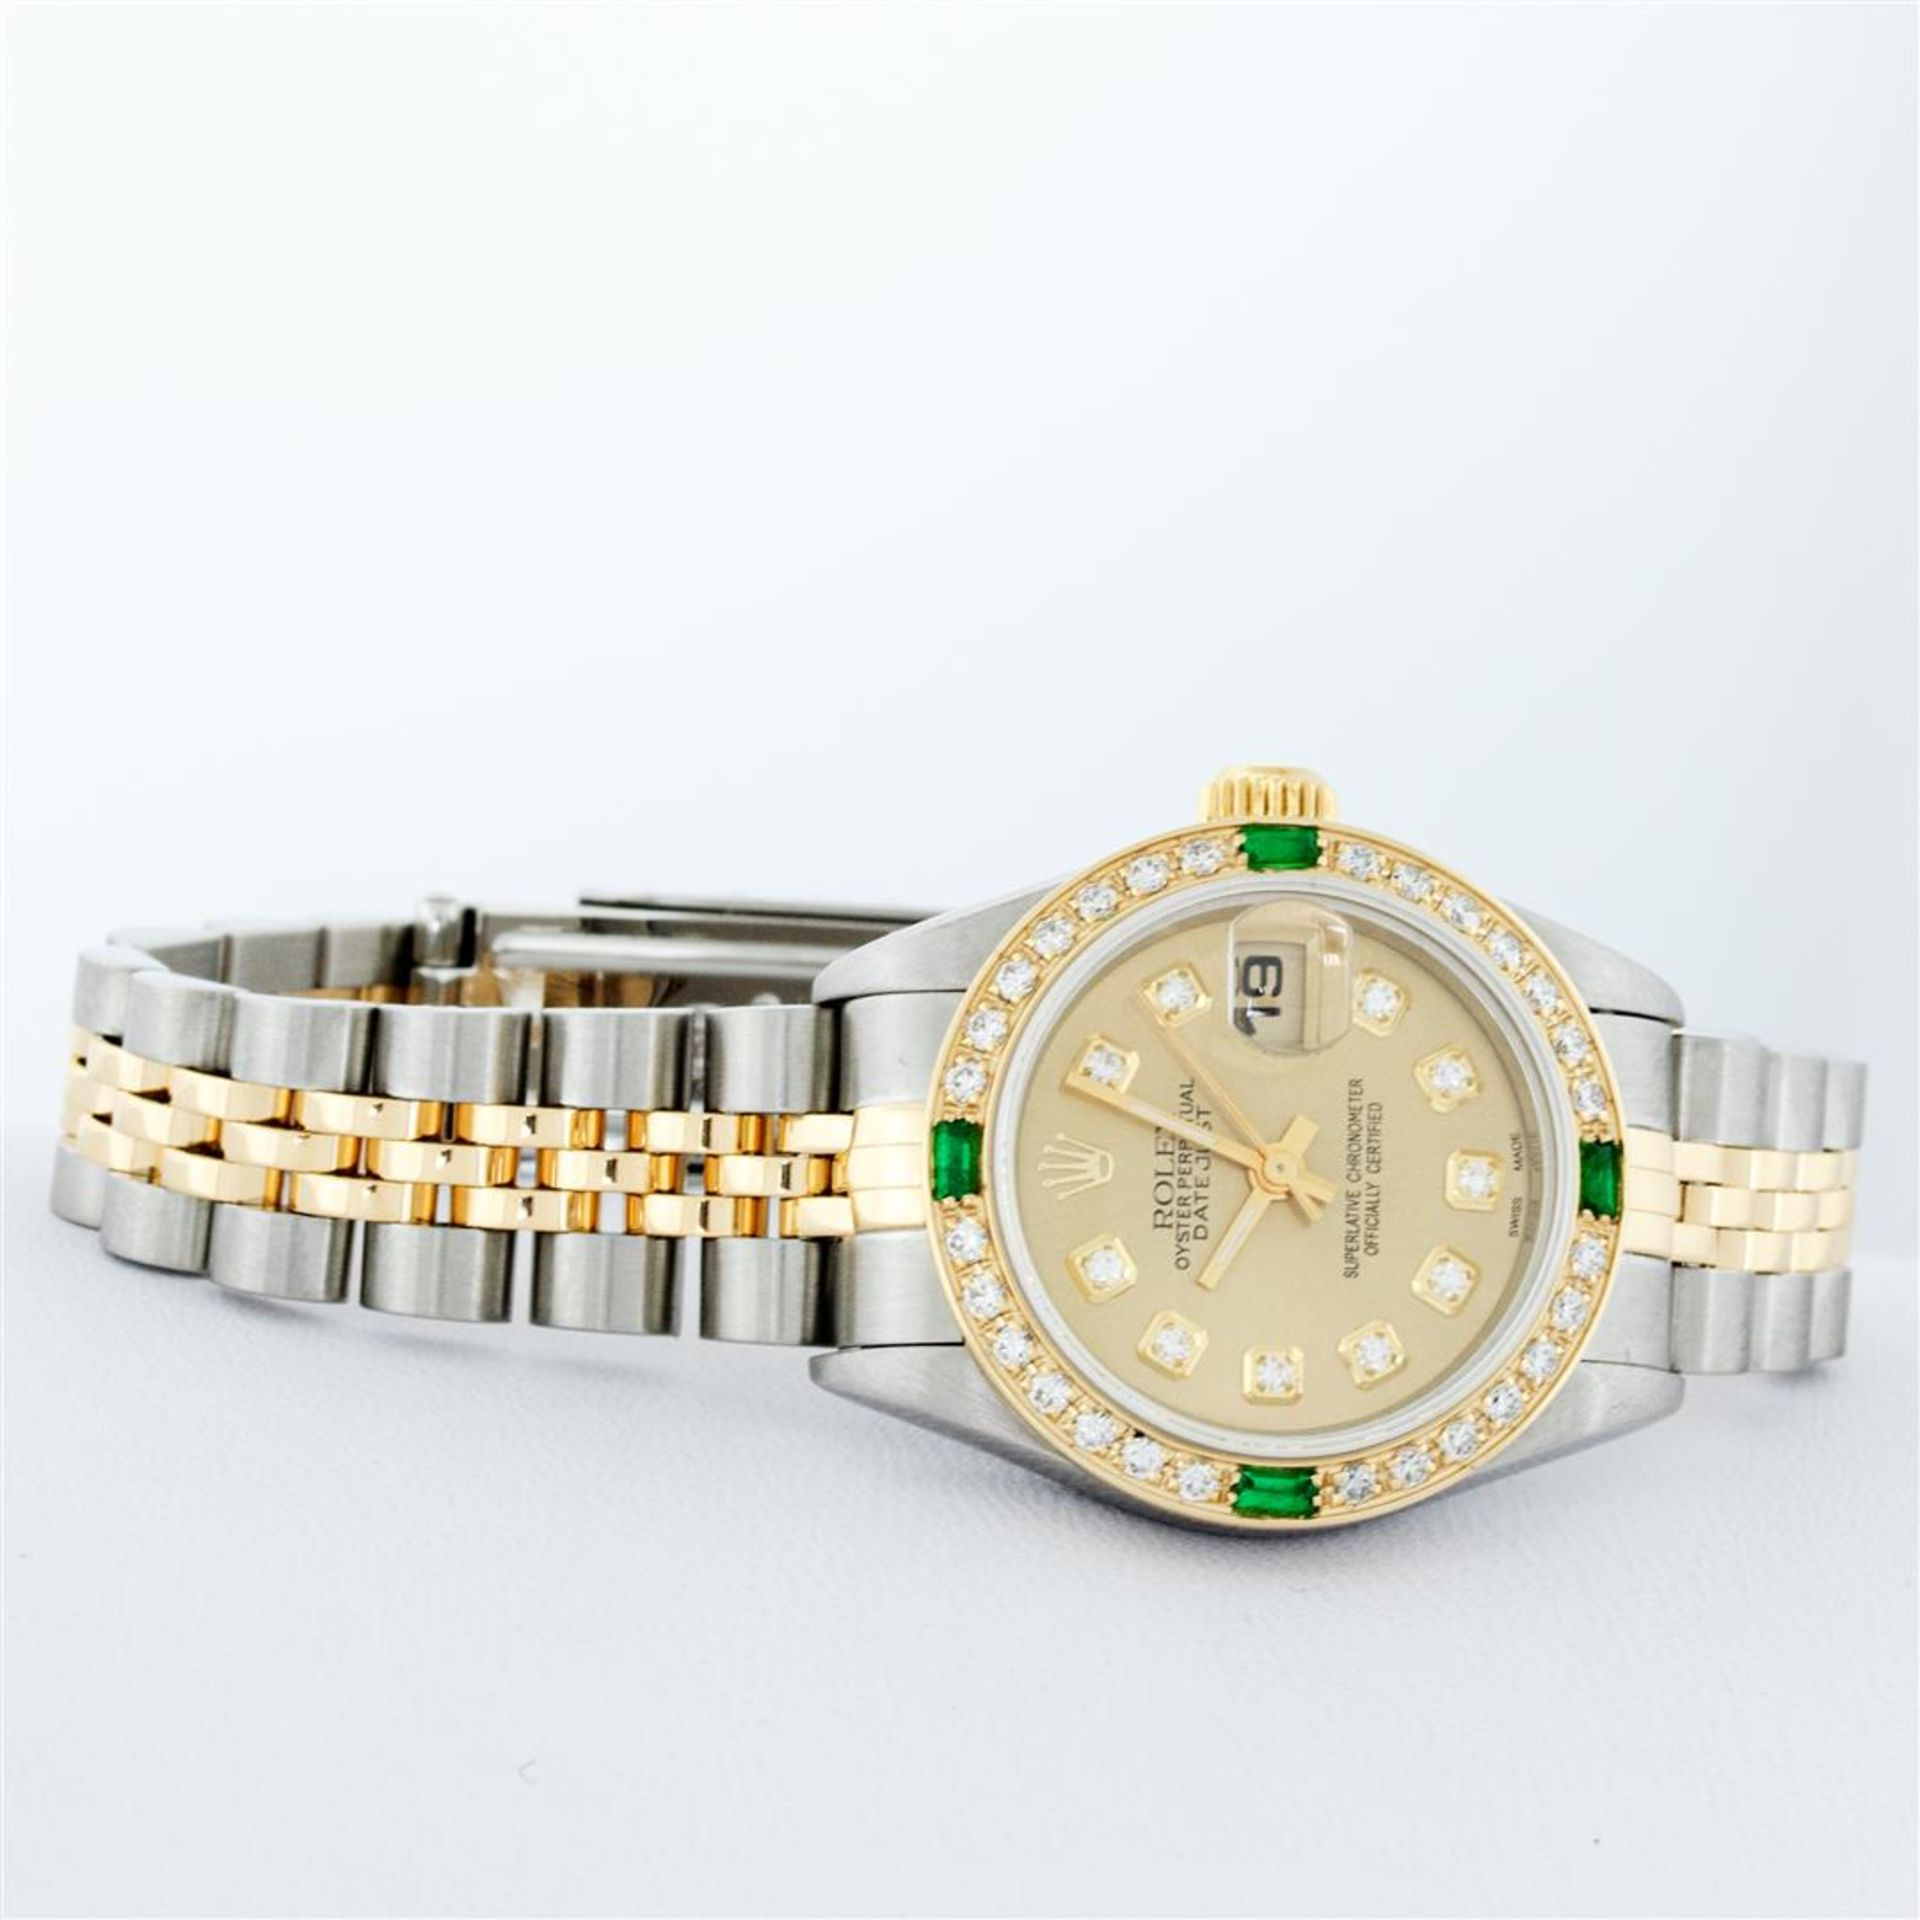 Rolex Ladies 2 Tone 18K Quickset Champagne Diamond & Emerald Datejust Wristwatch - Image 4 of 9